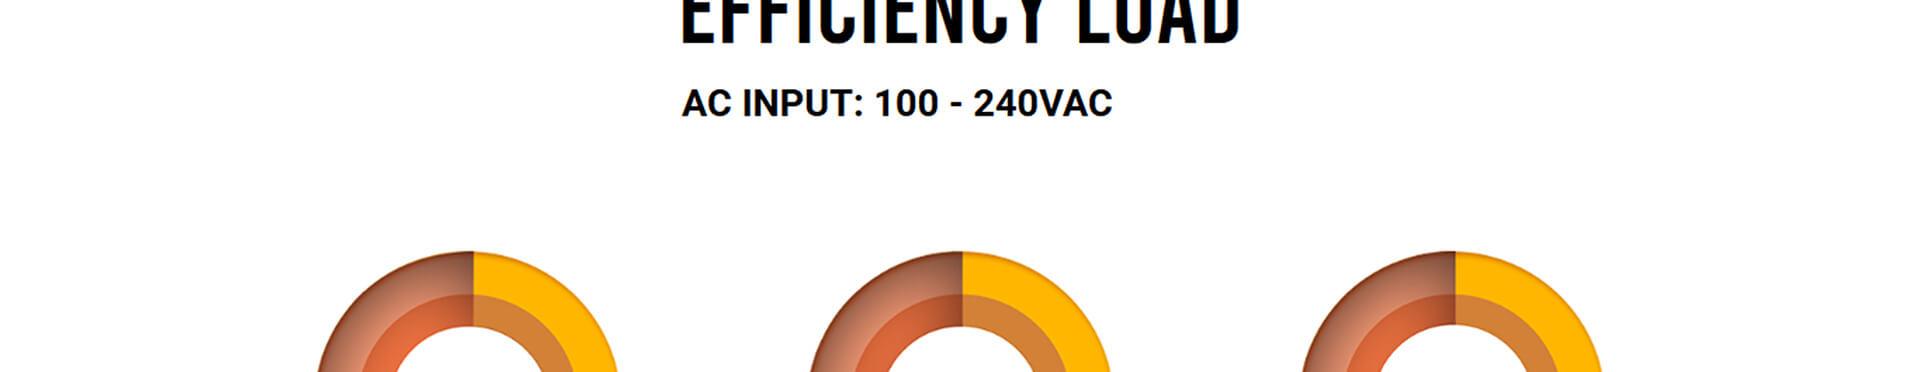 NeoECO-Modular-650-V2---antec_24.jpg